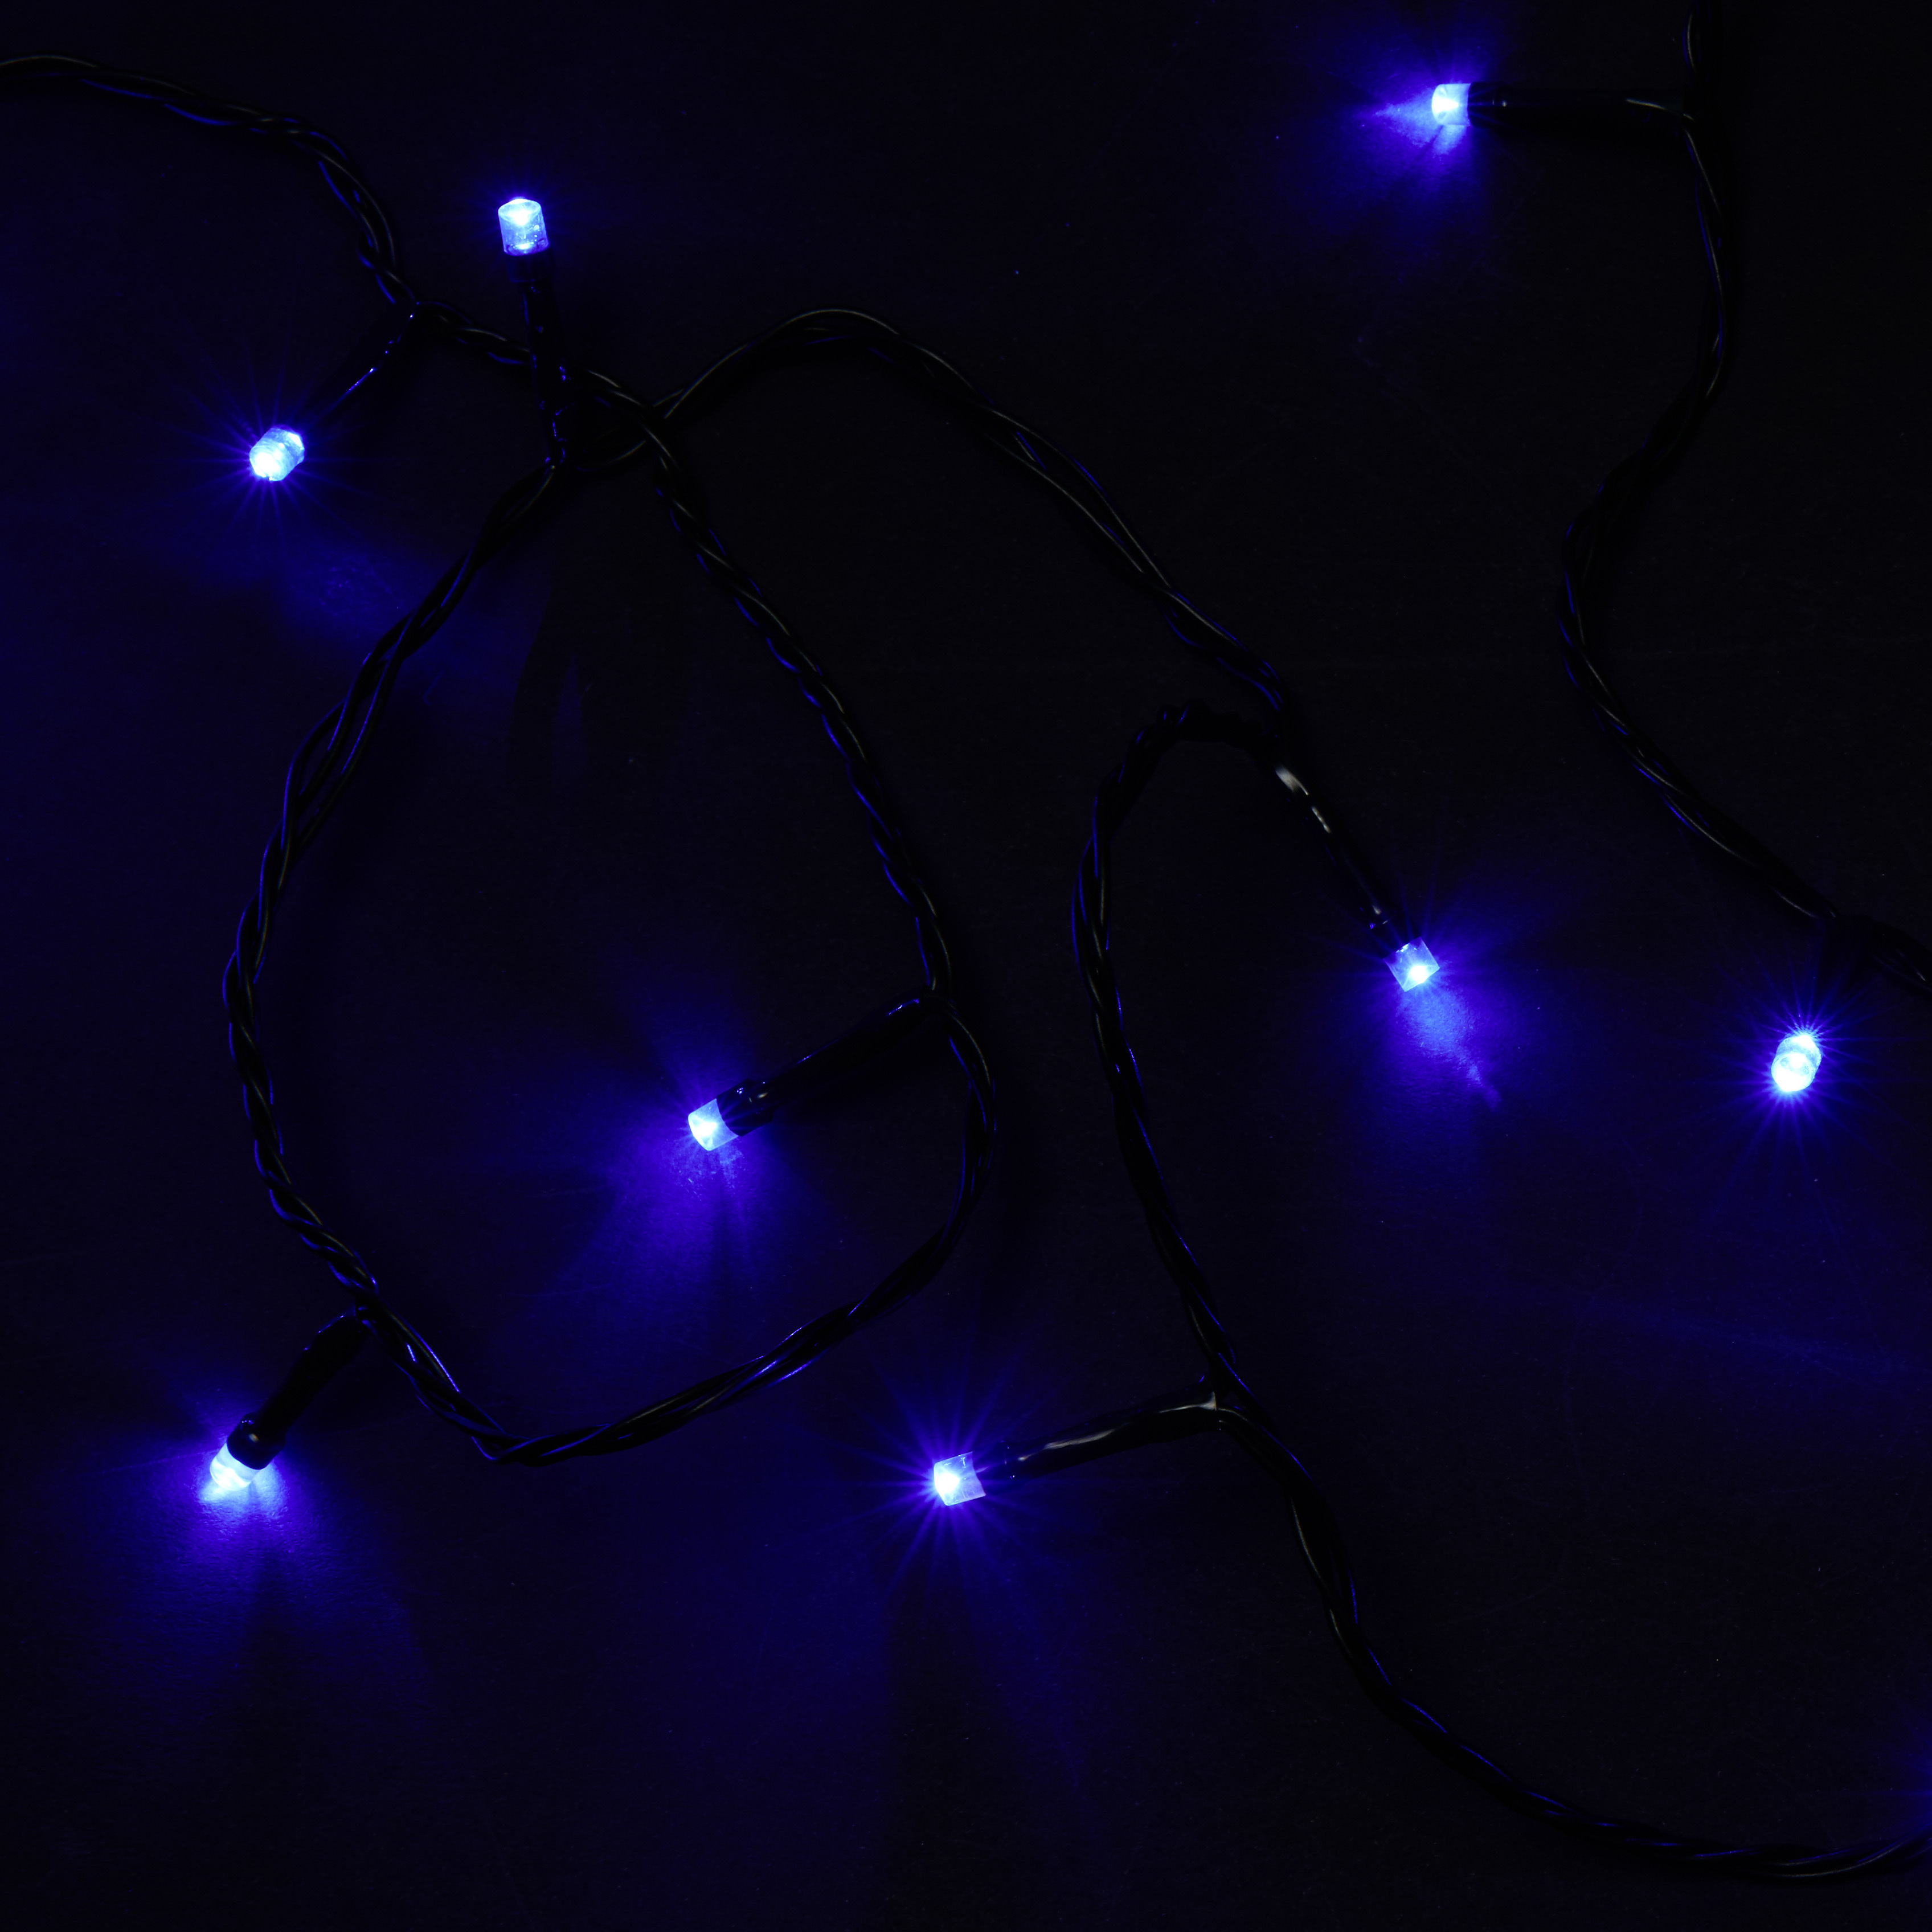 Guirlande lumineuse animée n° 23d - Bleu - L 24 m - DE61712